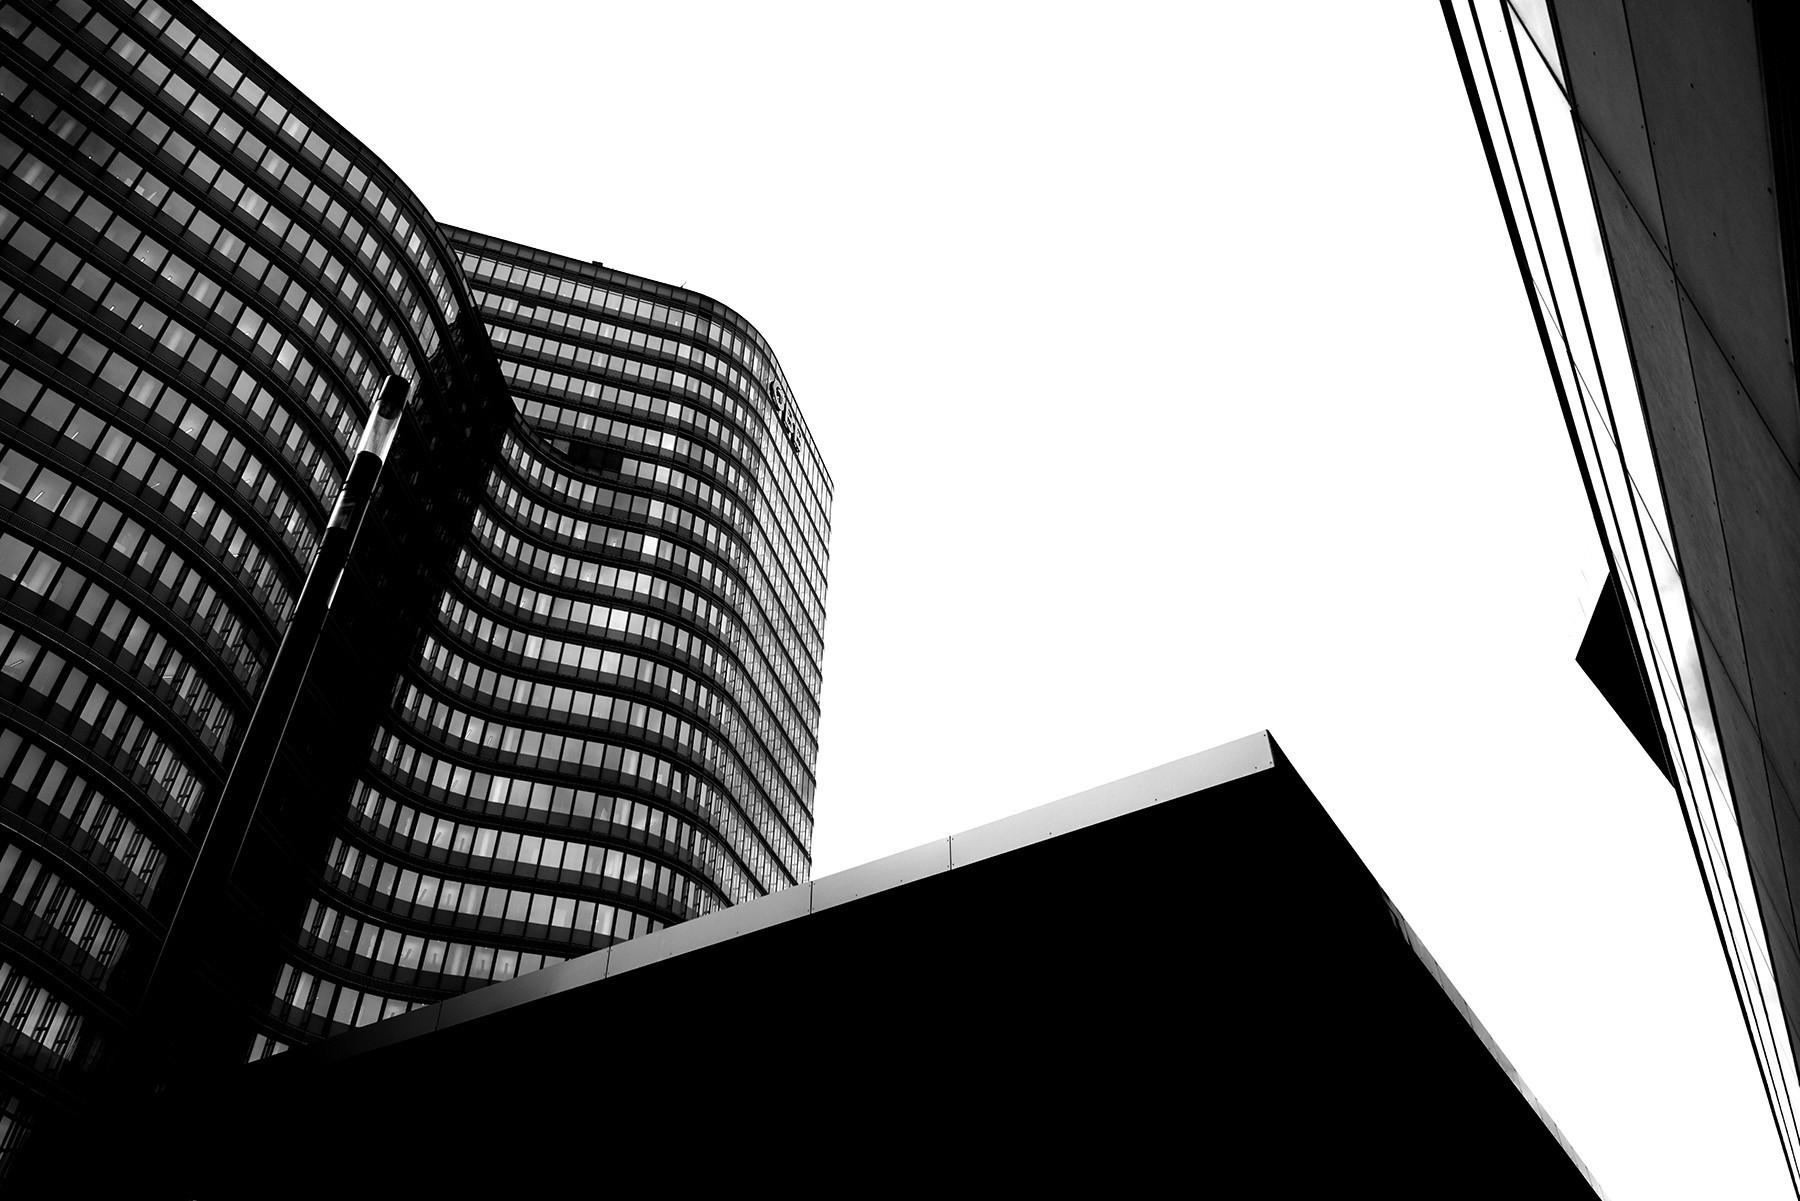 a012c-architektur-fotograf-fotostudio-pg_studios